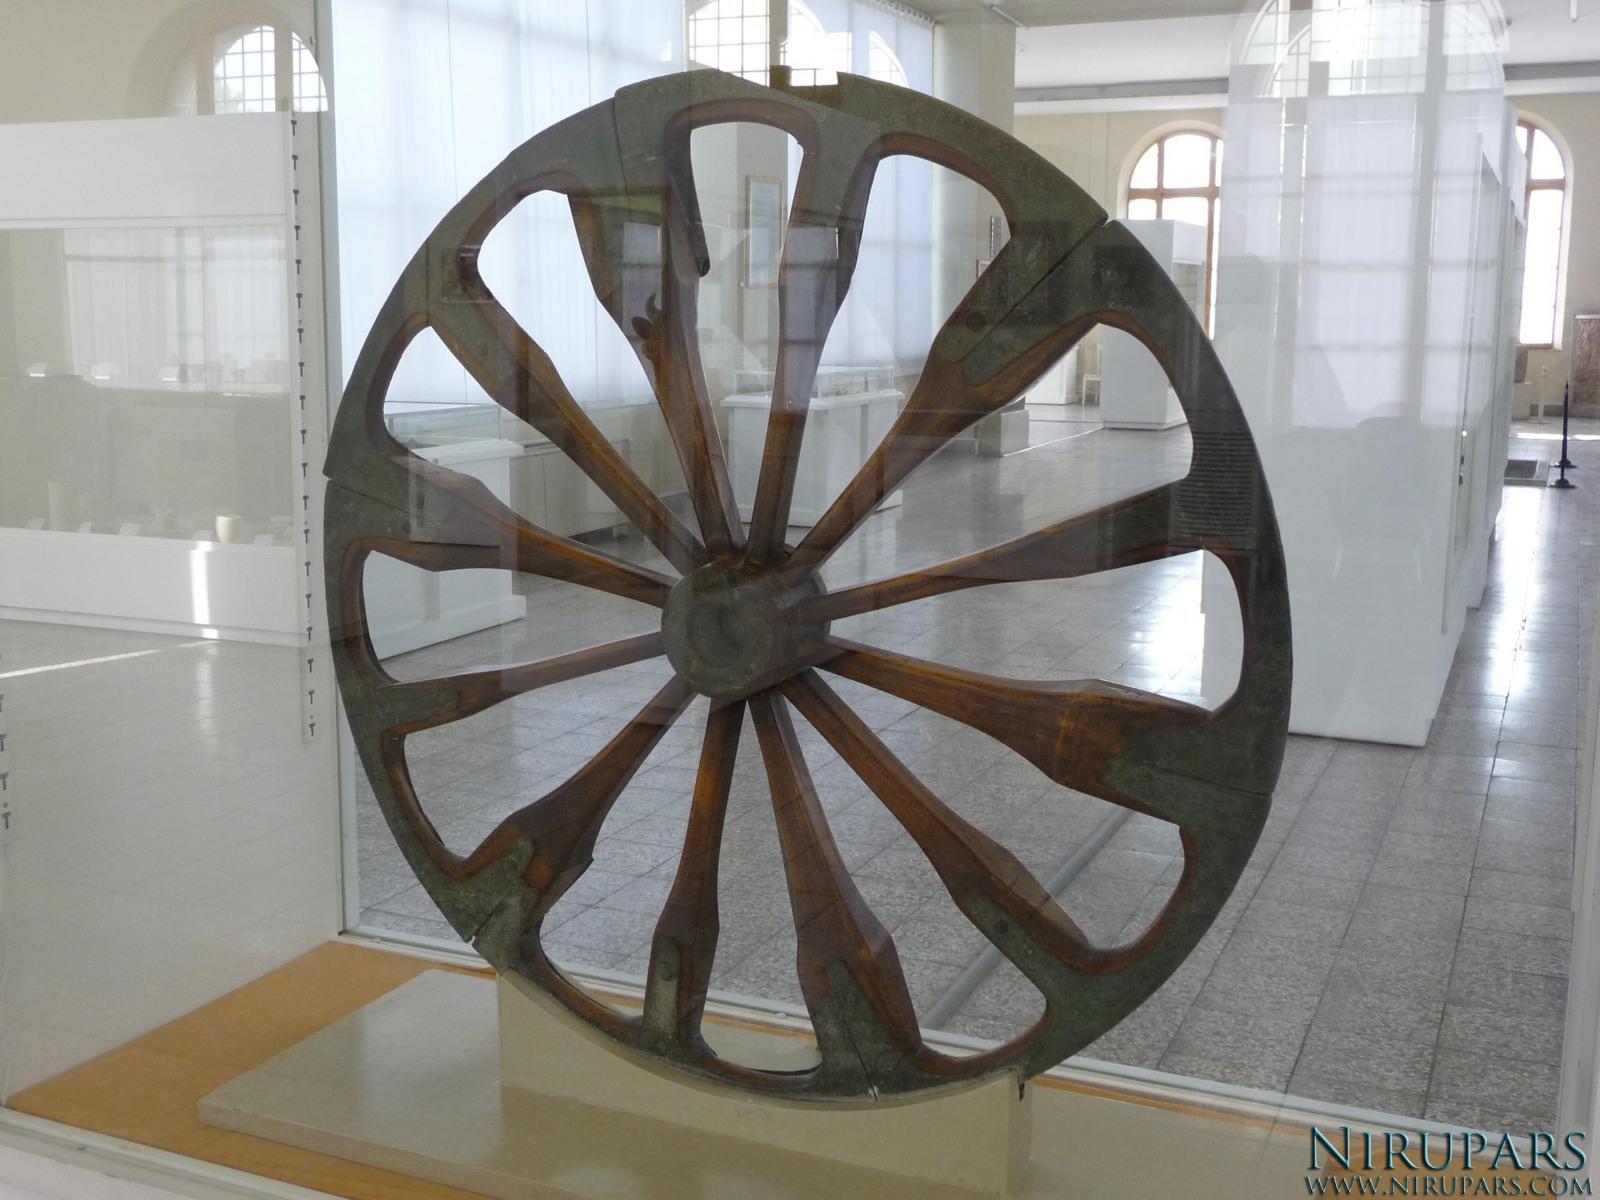 National Museum of Iran - Wheel Wood